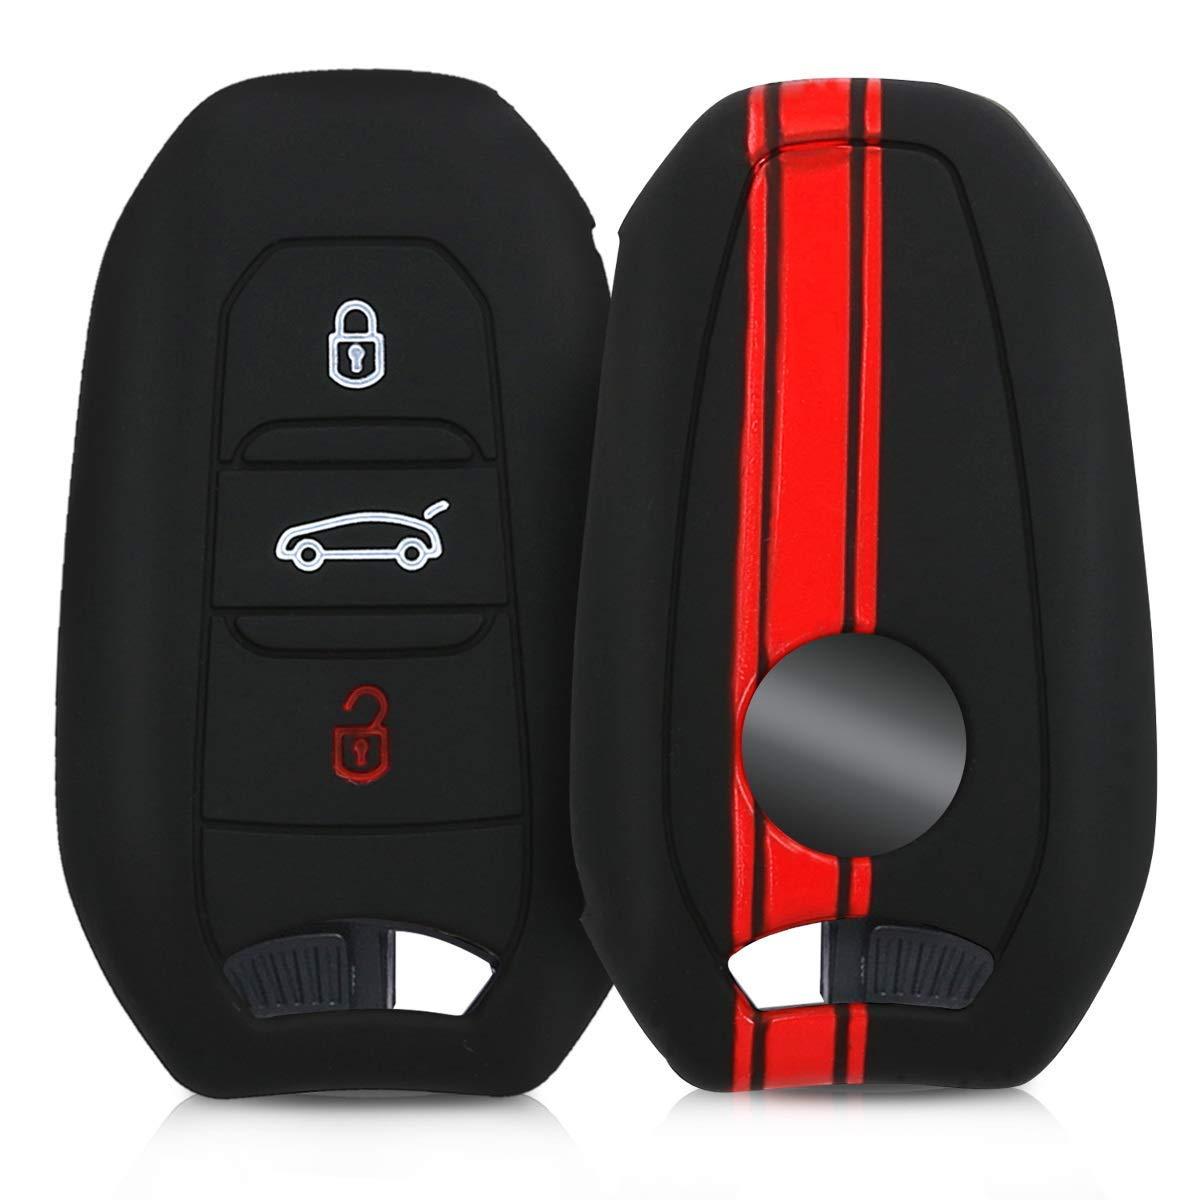 Cheap Car Key Fob Cases, find Car Key Fob Cases deals on